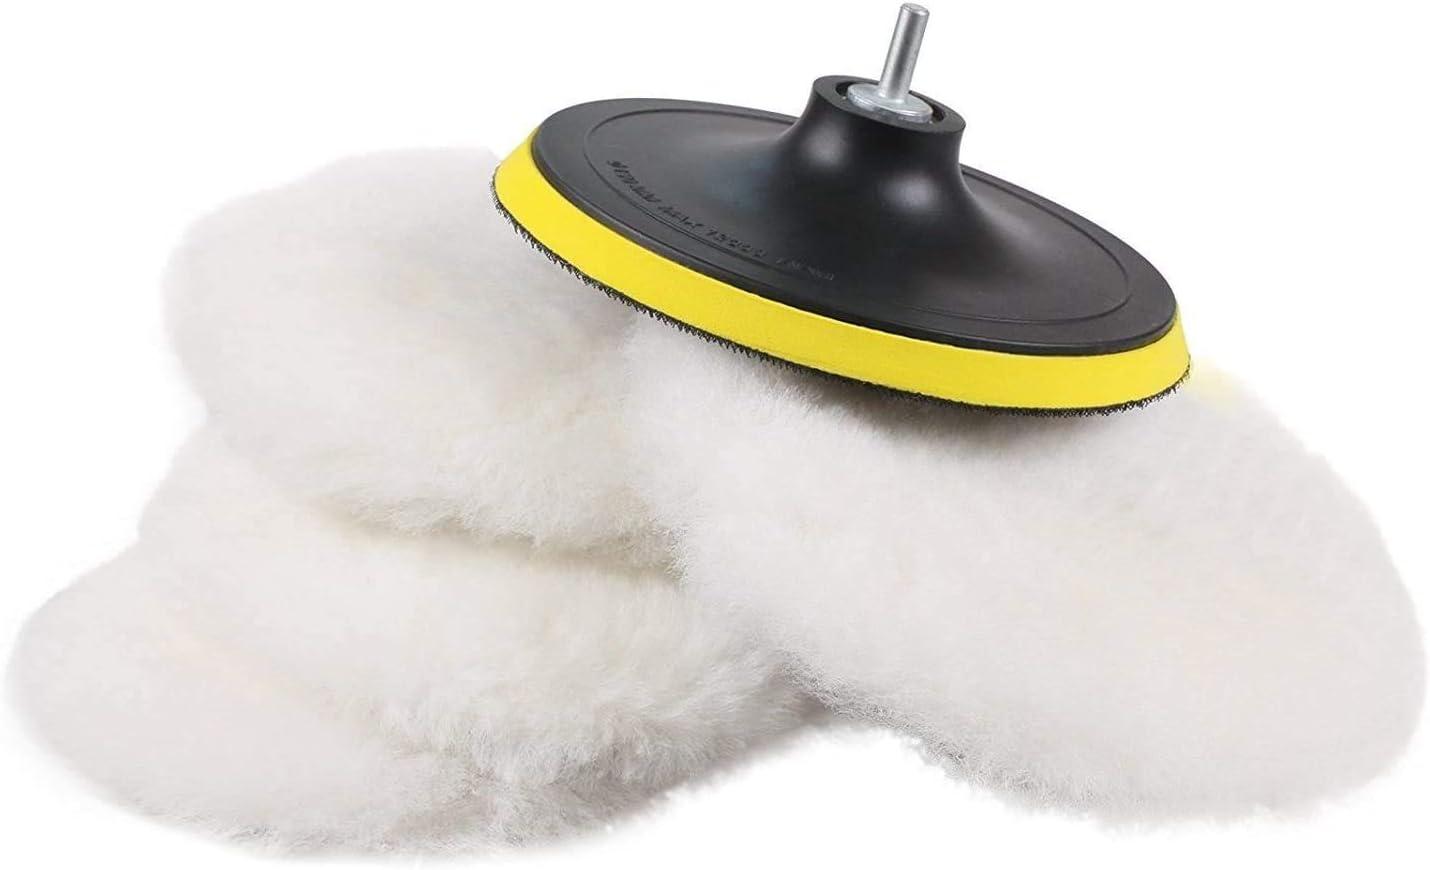 SPTA 6 Pcs 6 Inch Polishing Buffer Wool and Wheel Polishing Pad Woolen Polishing Waxing Pads Kits with Backing Plate for Car Polisher: Automotive